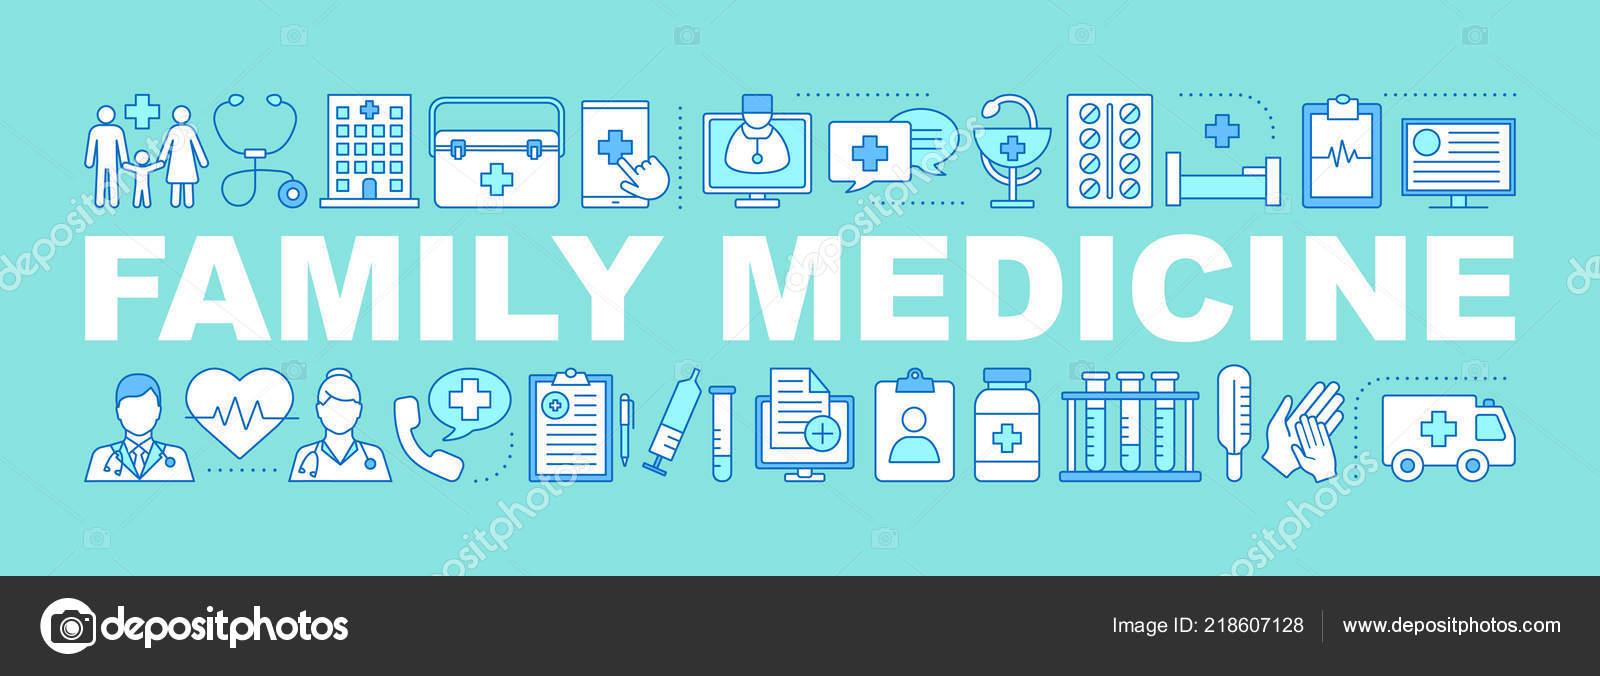 Family Medicine Word Concepts Banner Medicine Healthcare Diseases Diagnosis Treatment Stock Vector C Bsd 218607128